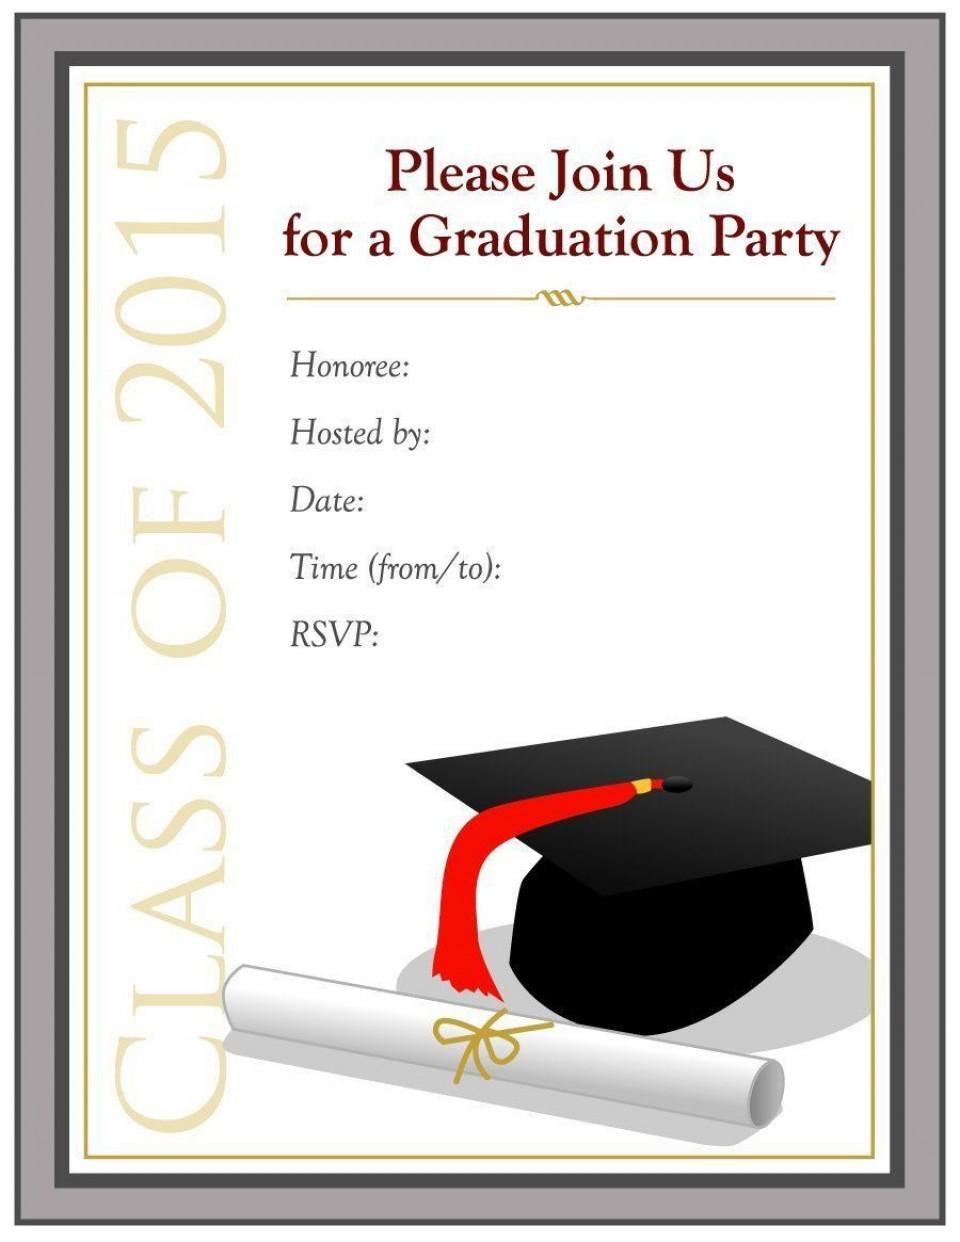 000 Awful Microsoft Word Graduation Invitation Template Image  Party960